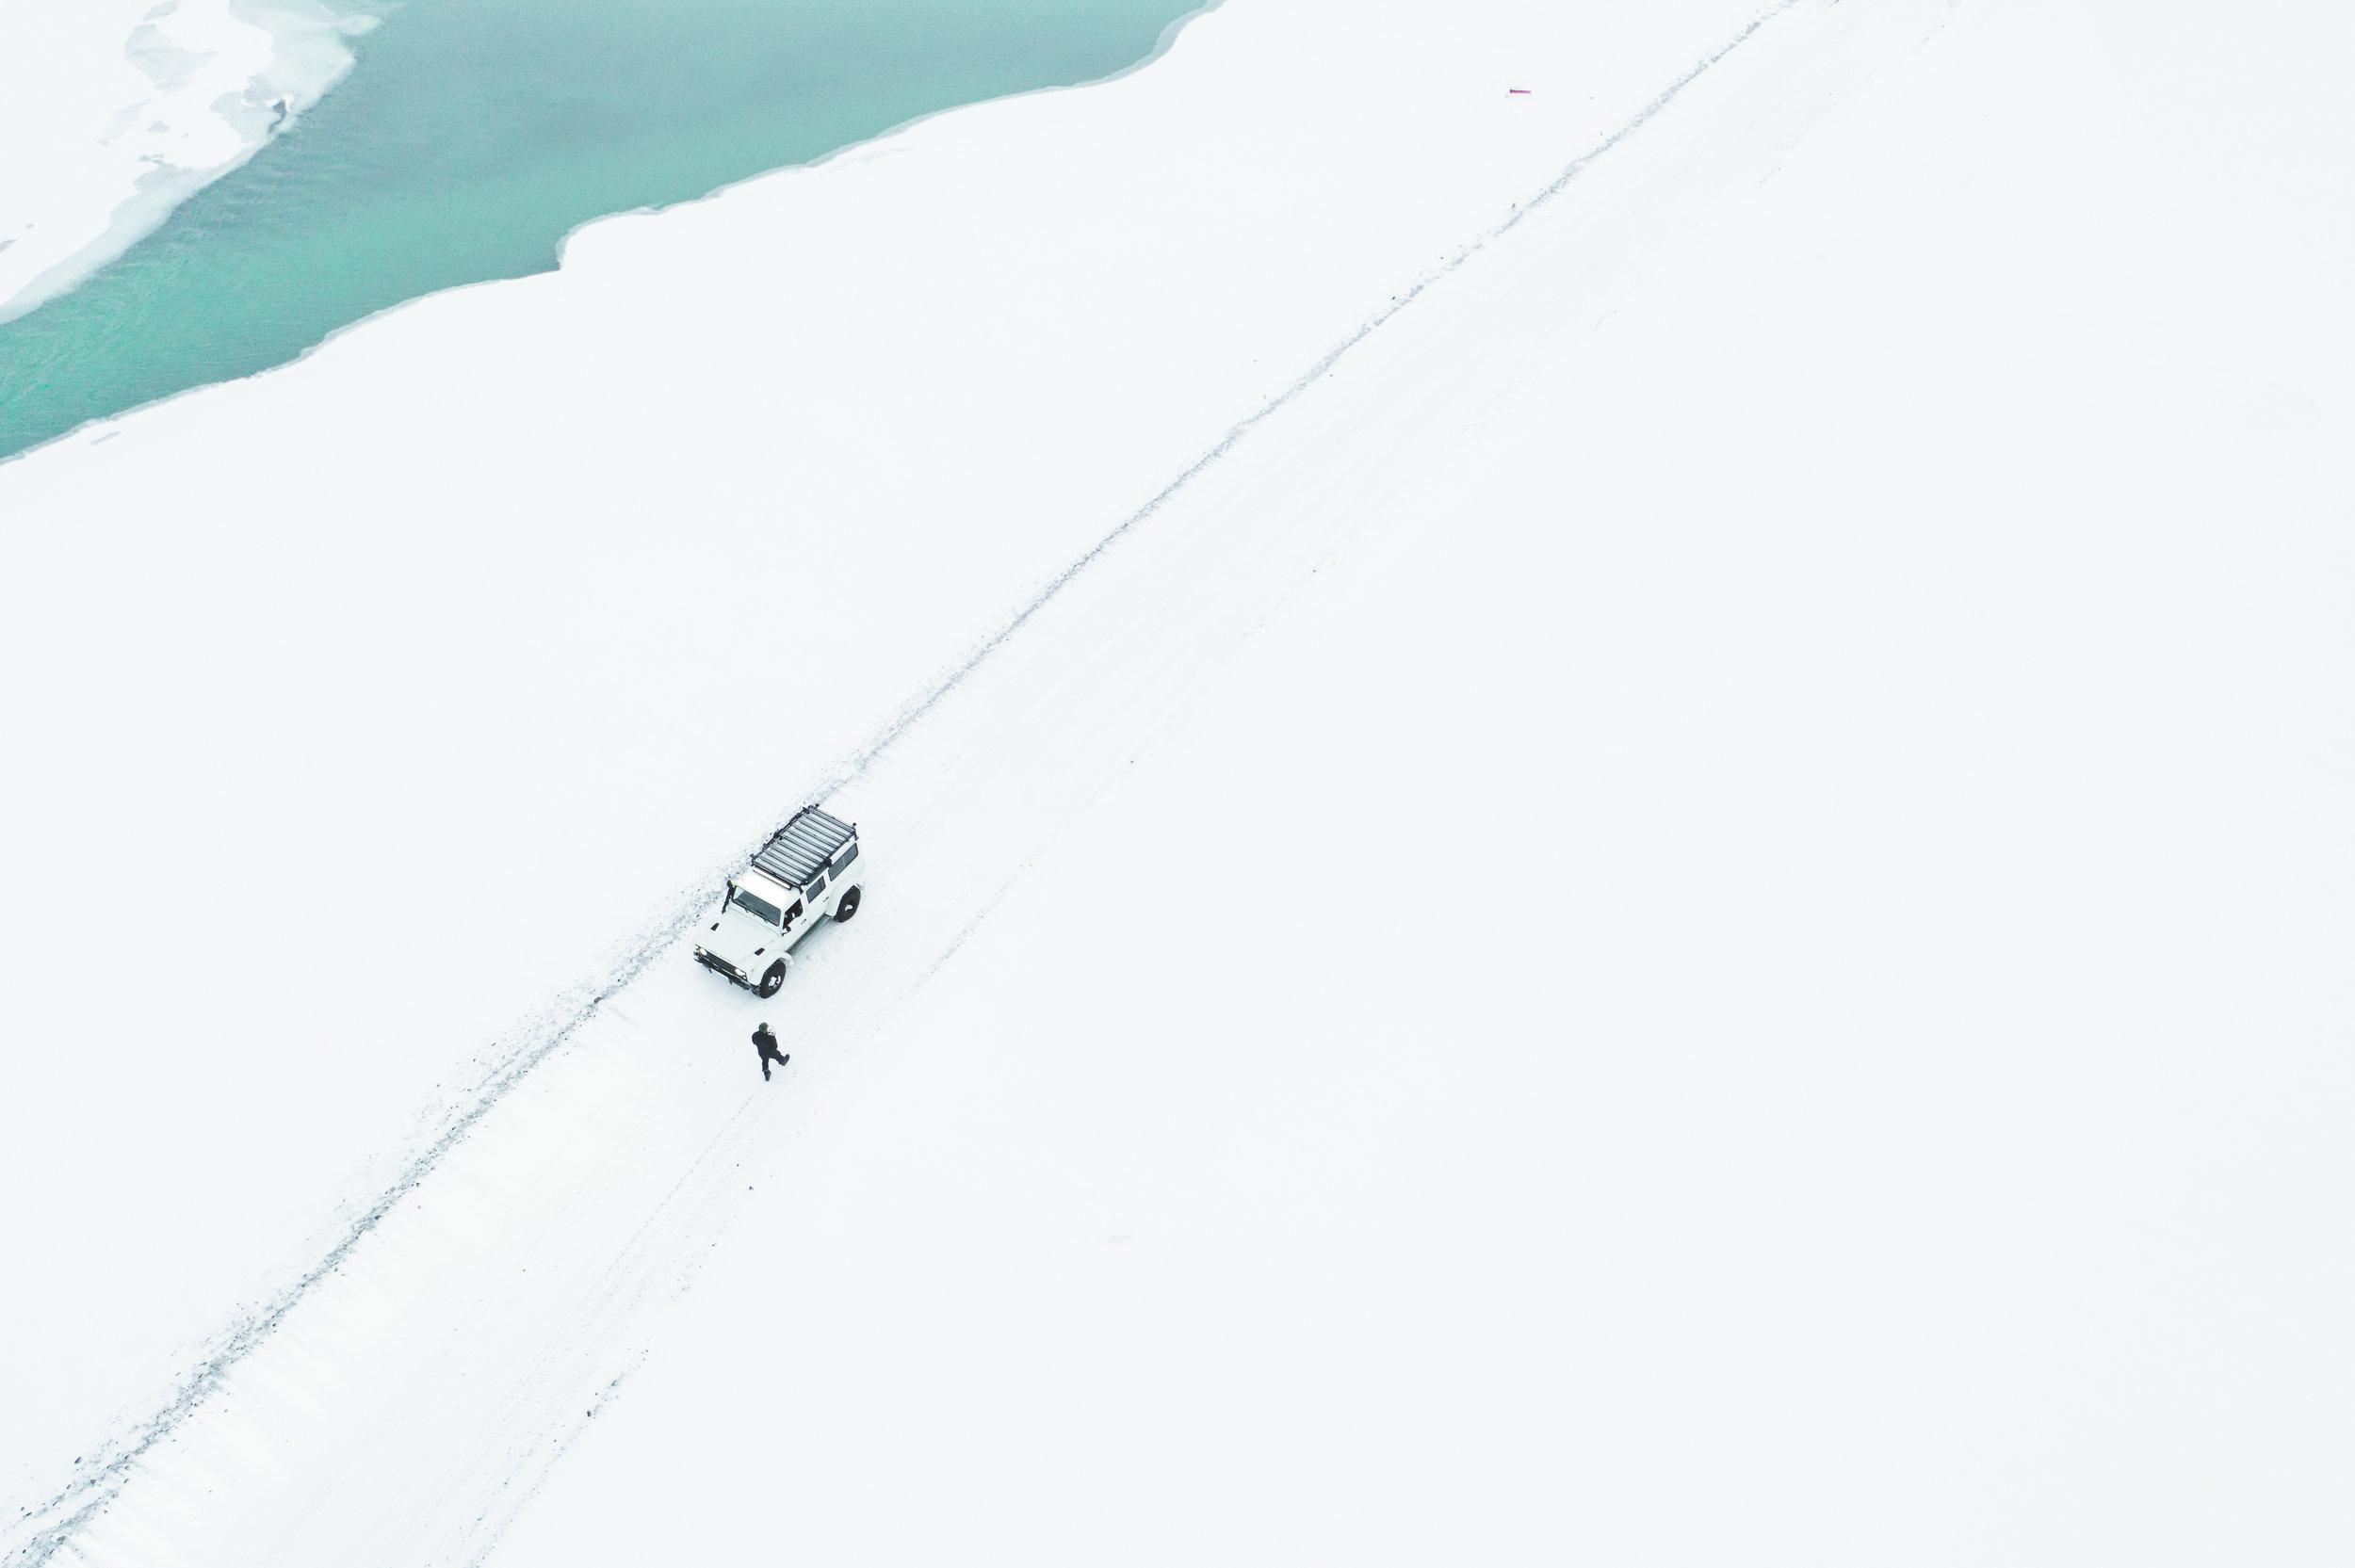 DJI_0001-Edit-iceland-benjamin-hardman.jpg